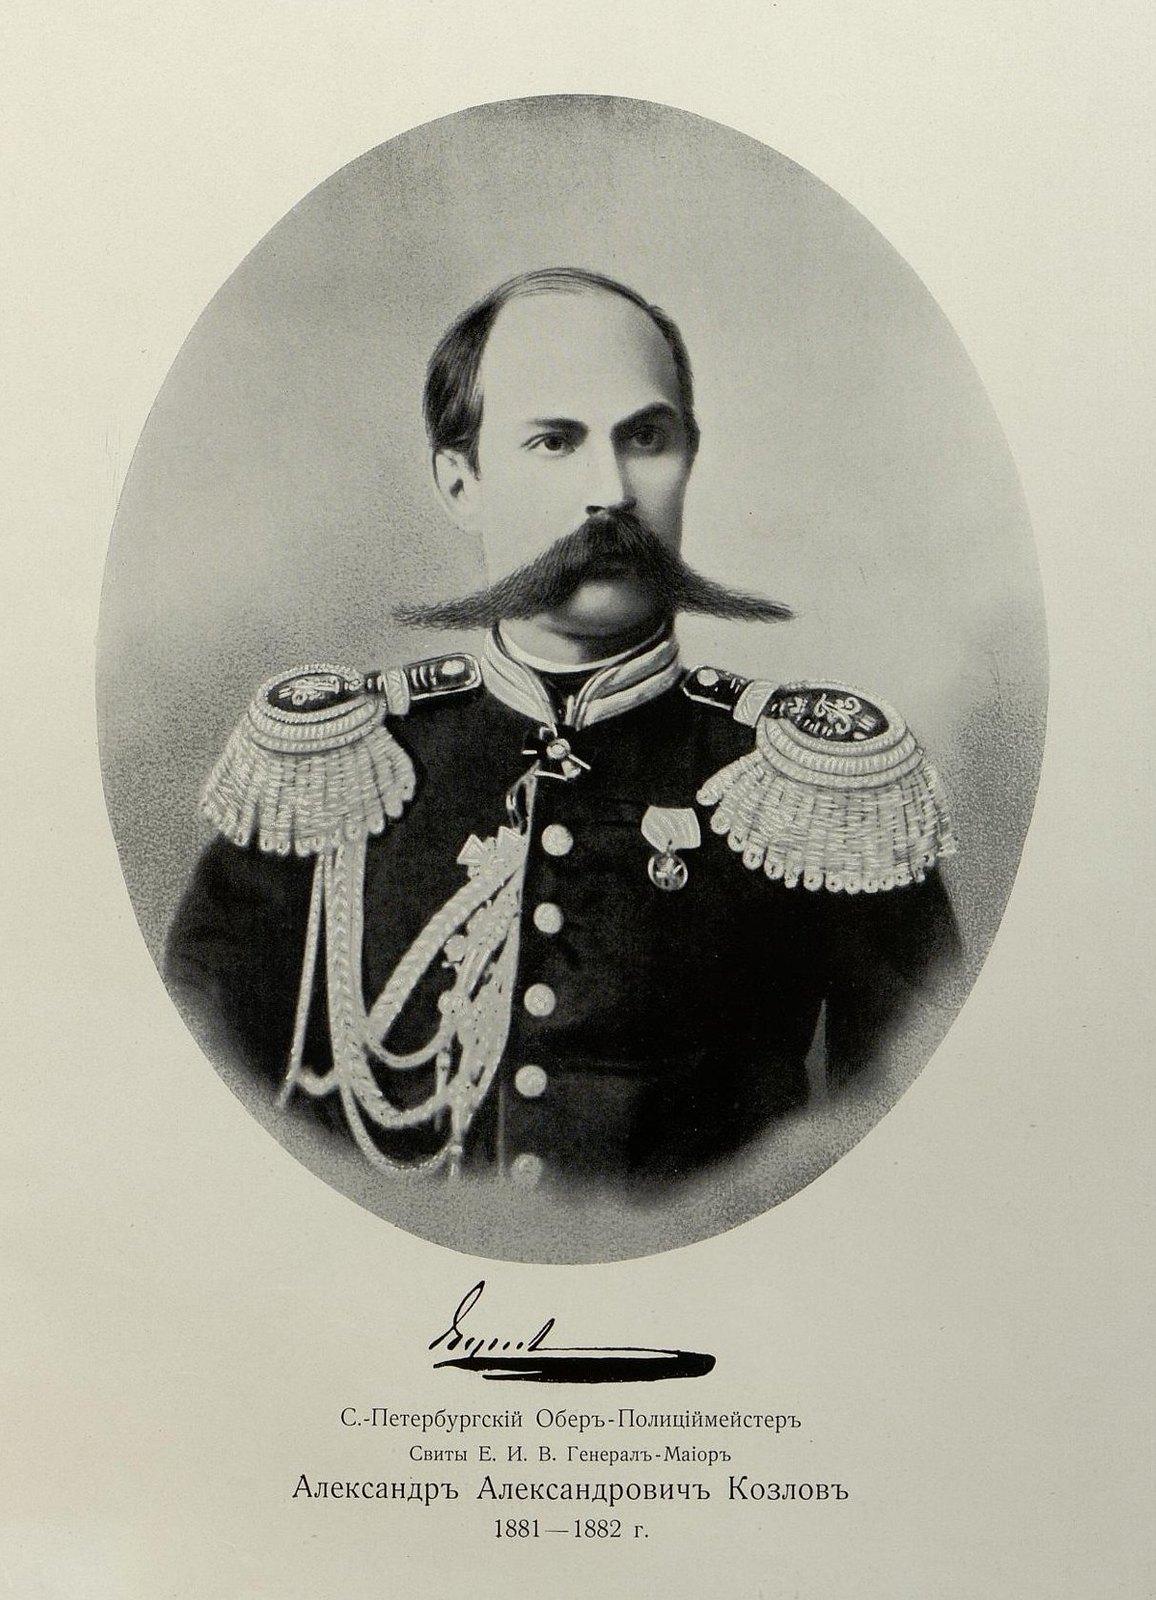 18. Портрет Александра Александровича Козлова